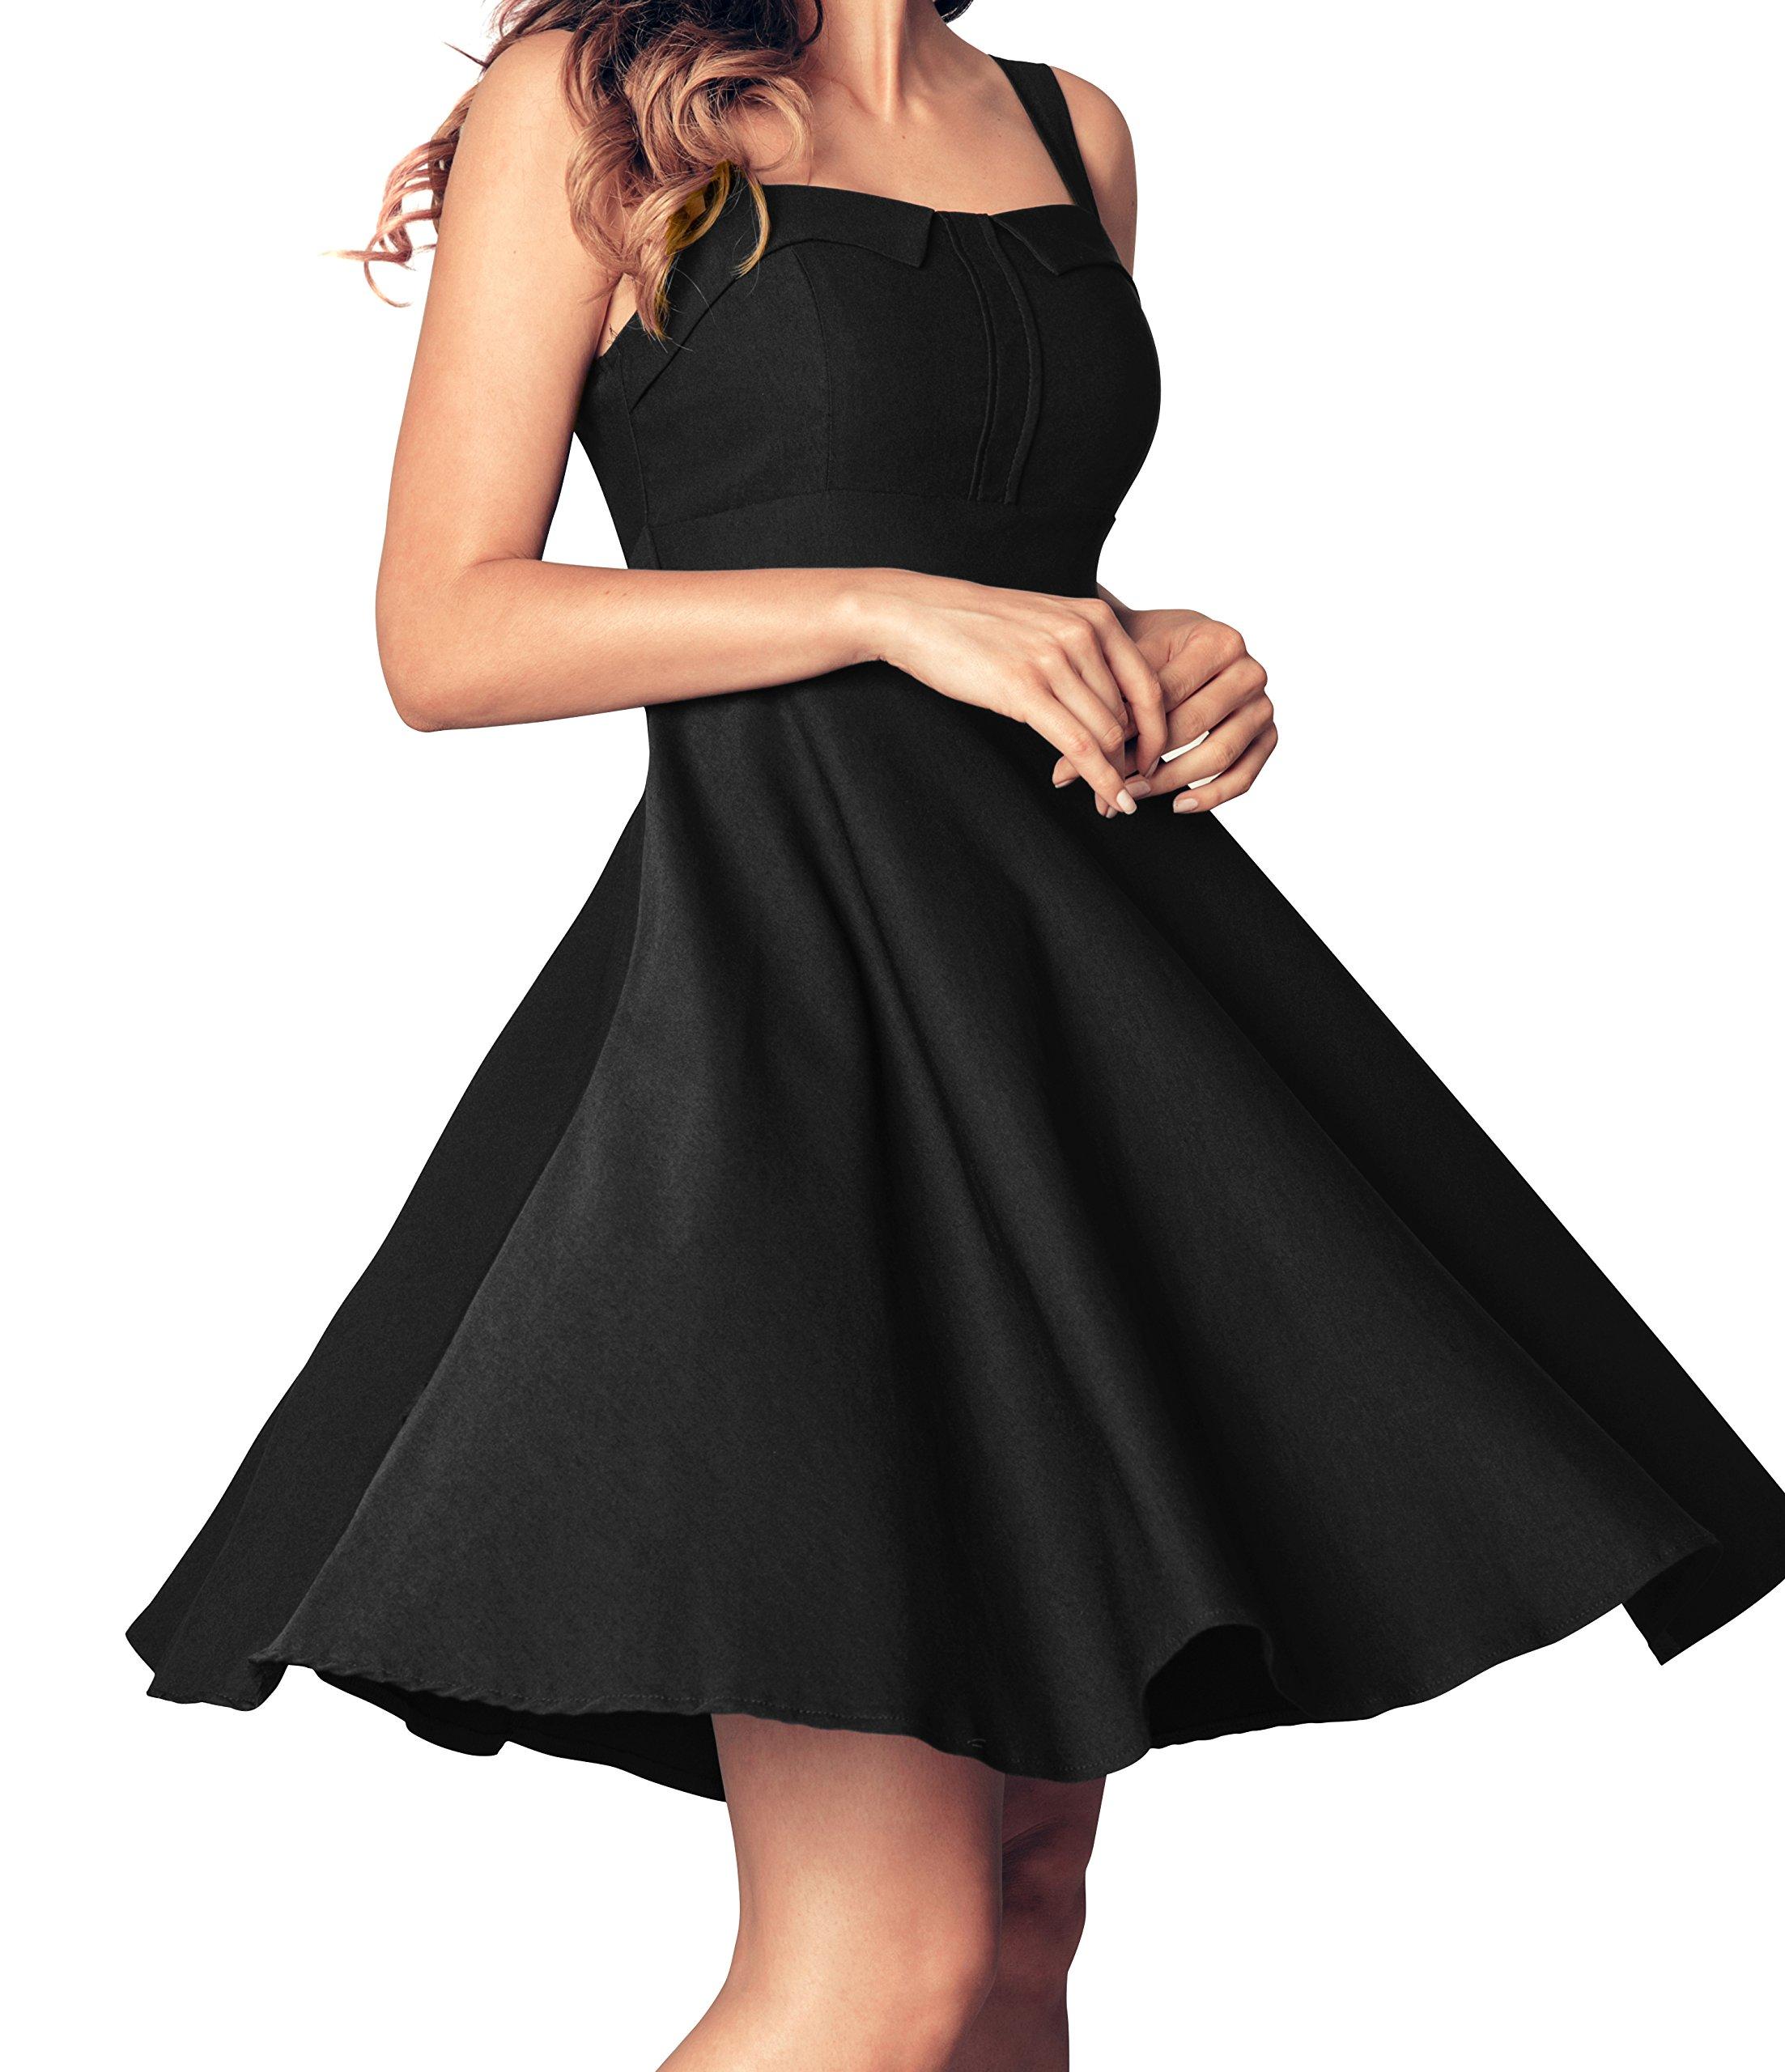 Angerella Retro Dresses for Women Vintage Black Party Sleeveless Dress